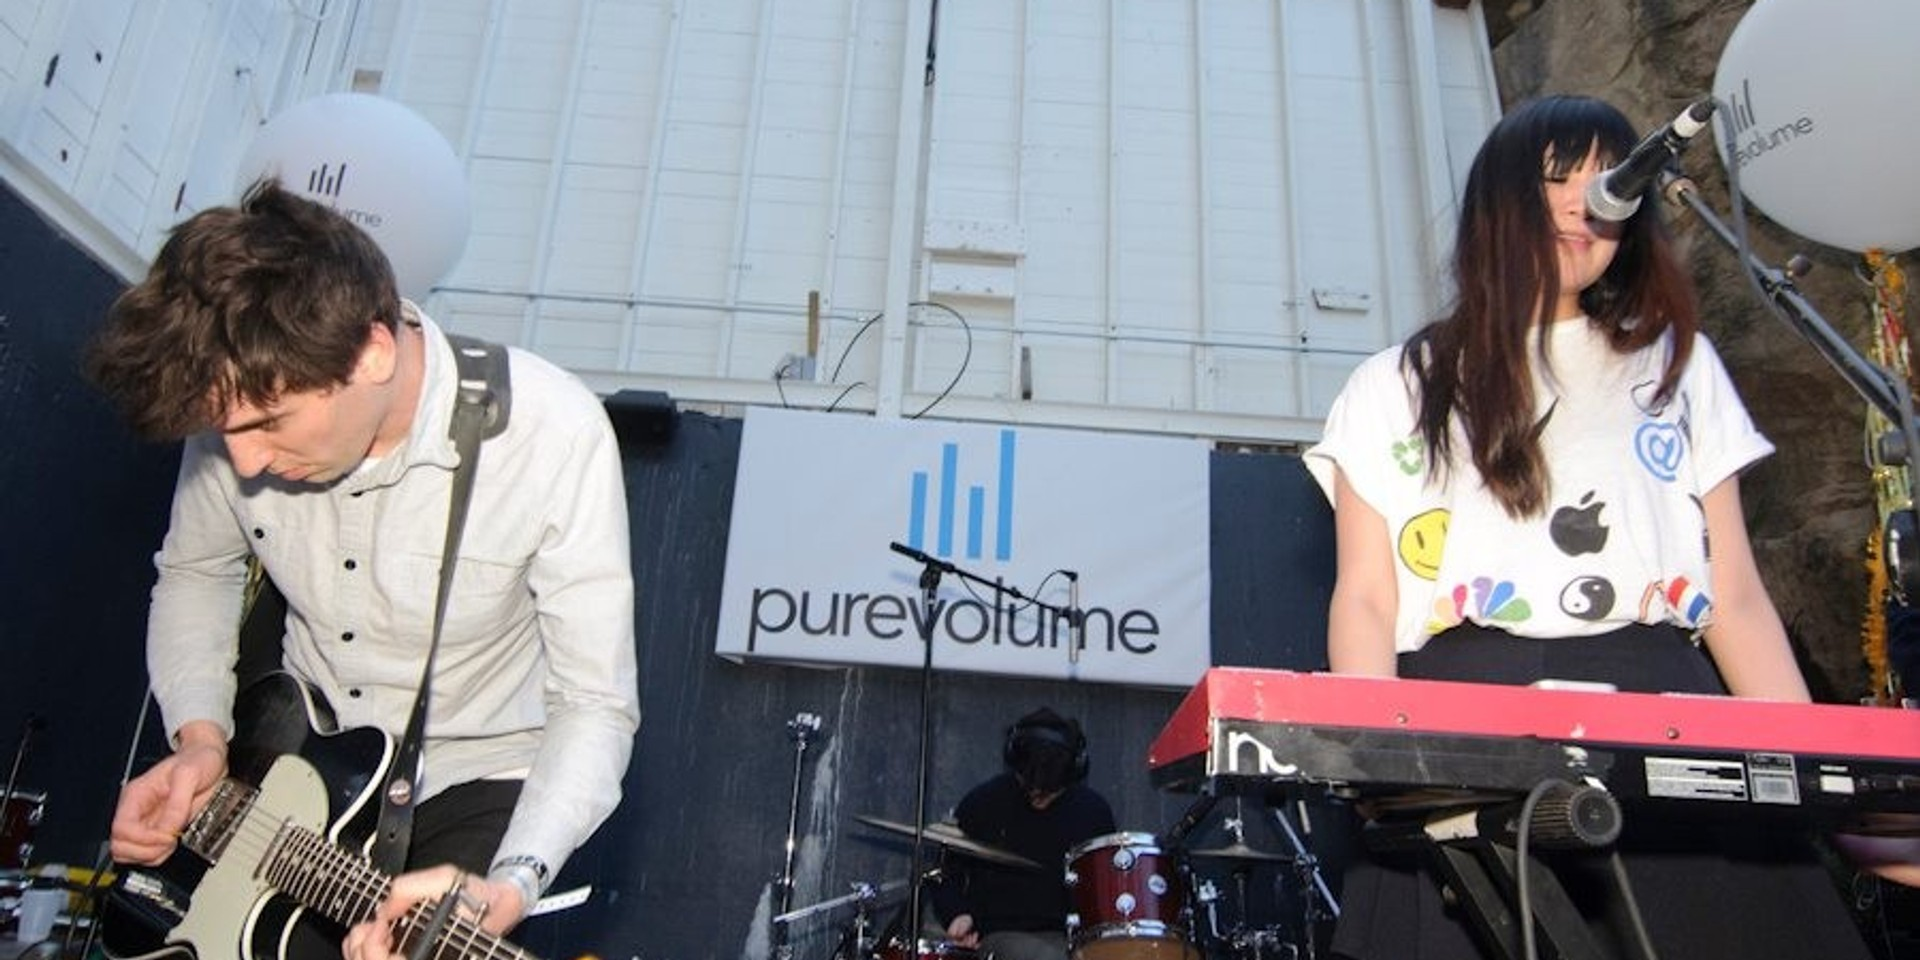 Music streaming website PureVolume is shutting down